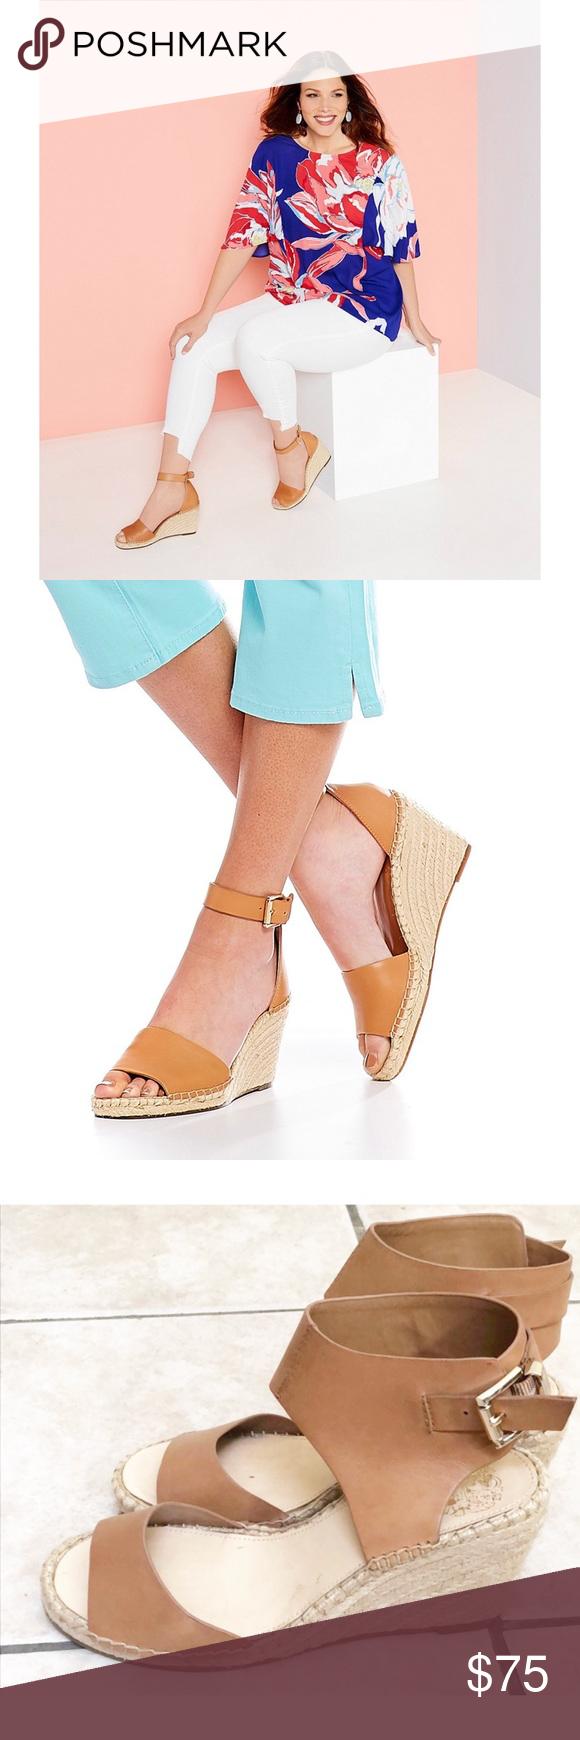 ✨ Ankle Strap Espadrille Wedge Sandals